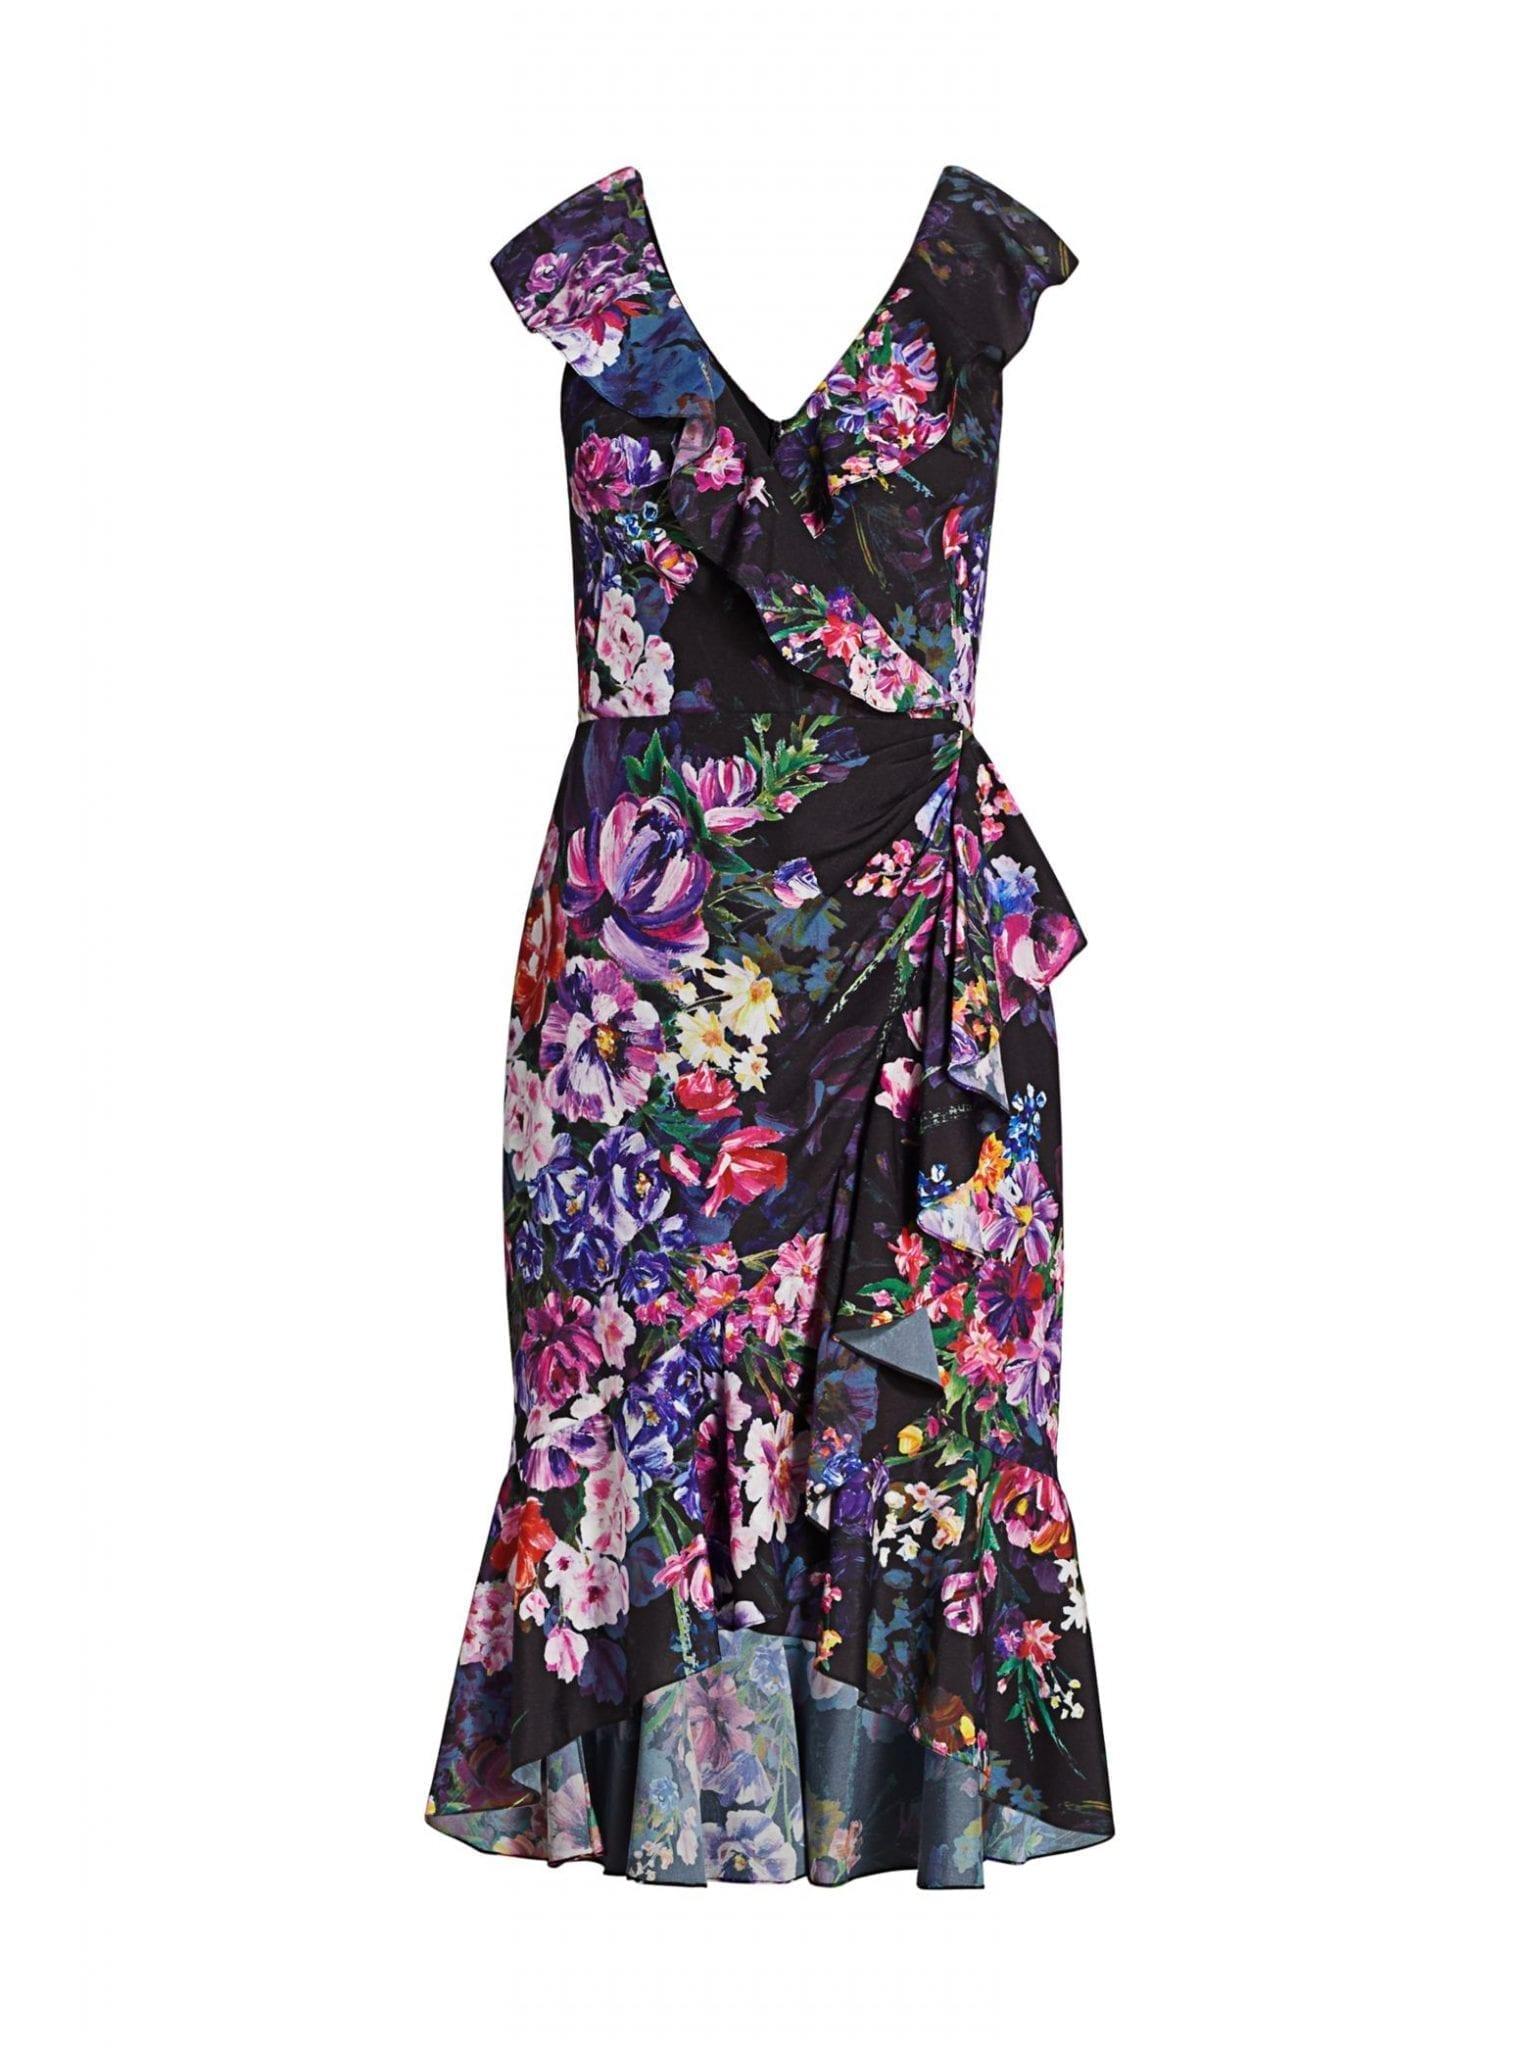 MARCHESA NOTTE Floral Crepe High-low Dress